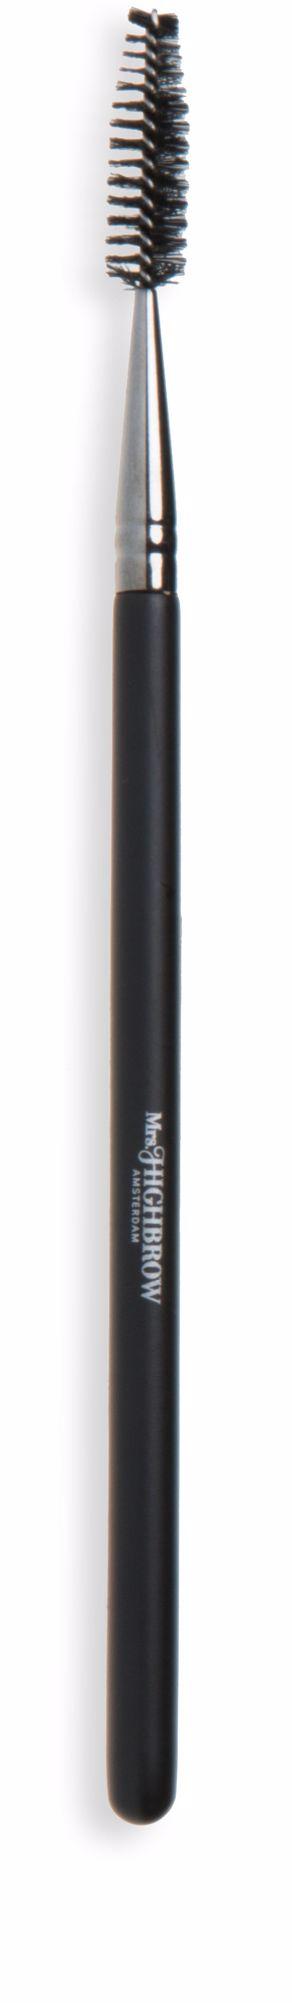 Spoolie Brush Black/Silver